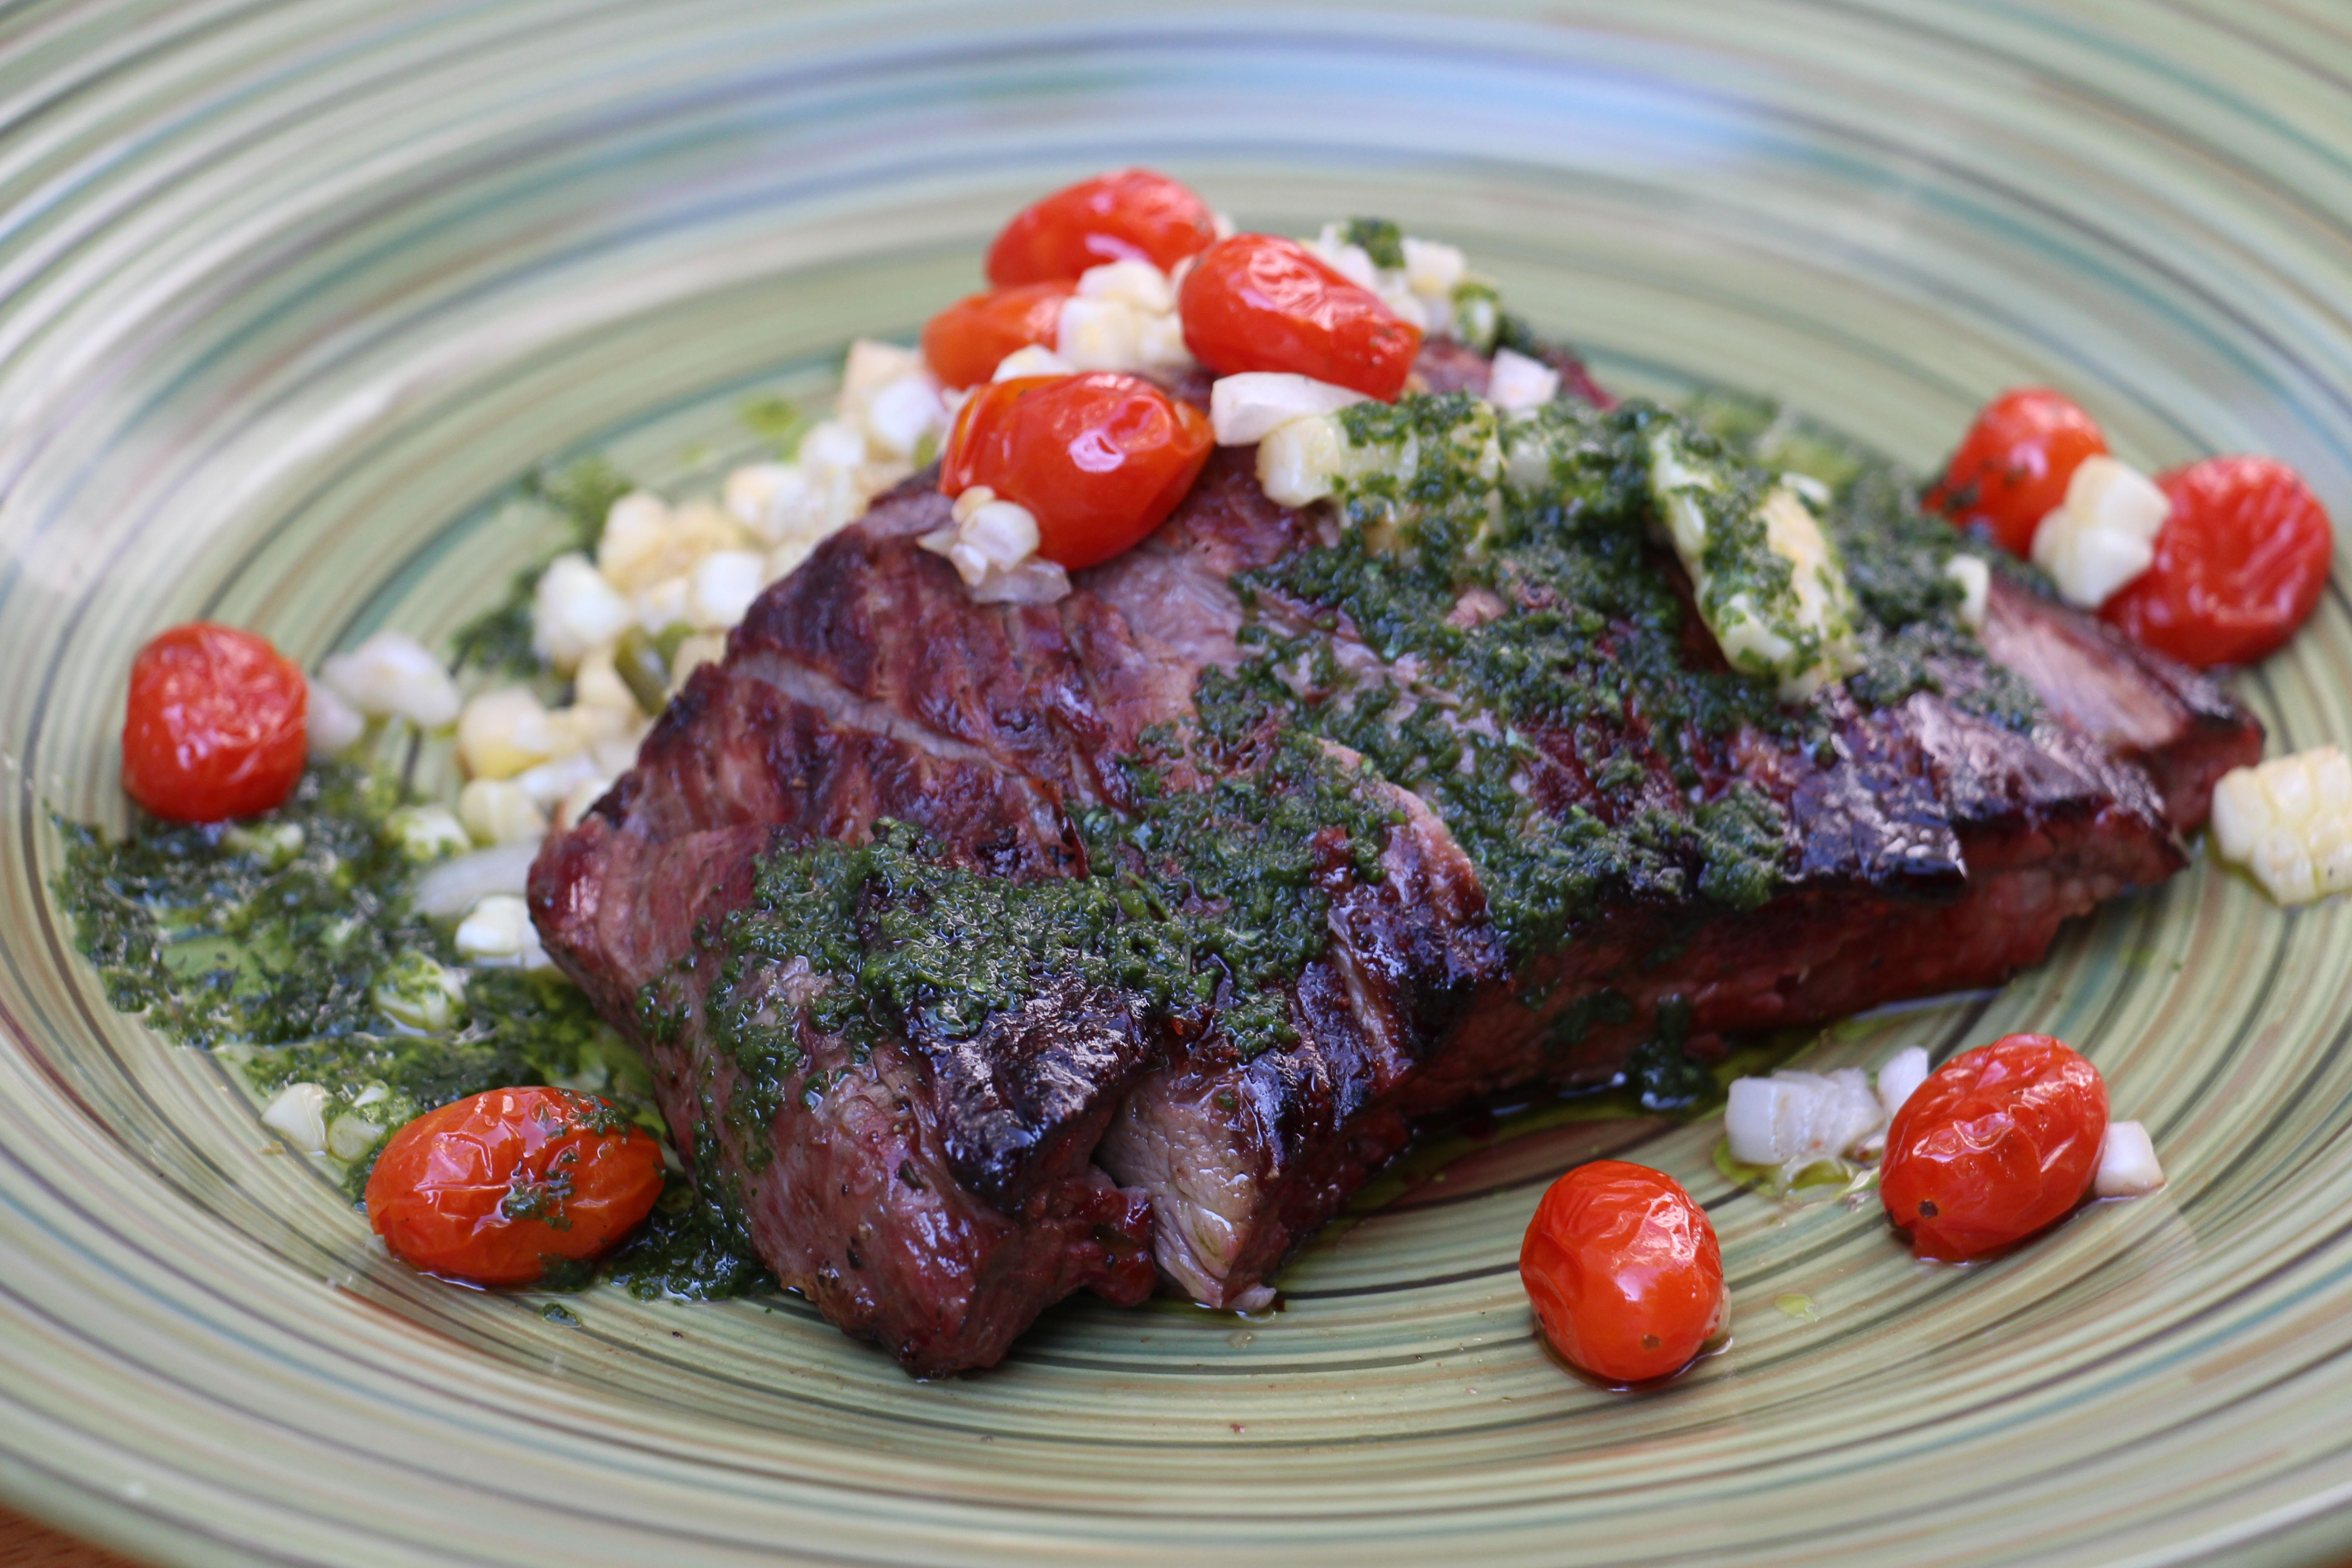 BBQ Skirt Steak with Warm Potato Salad advise